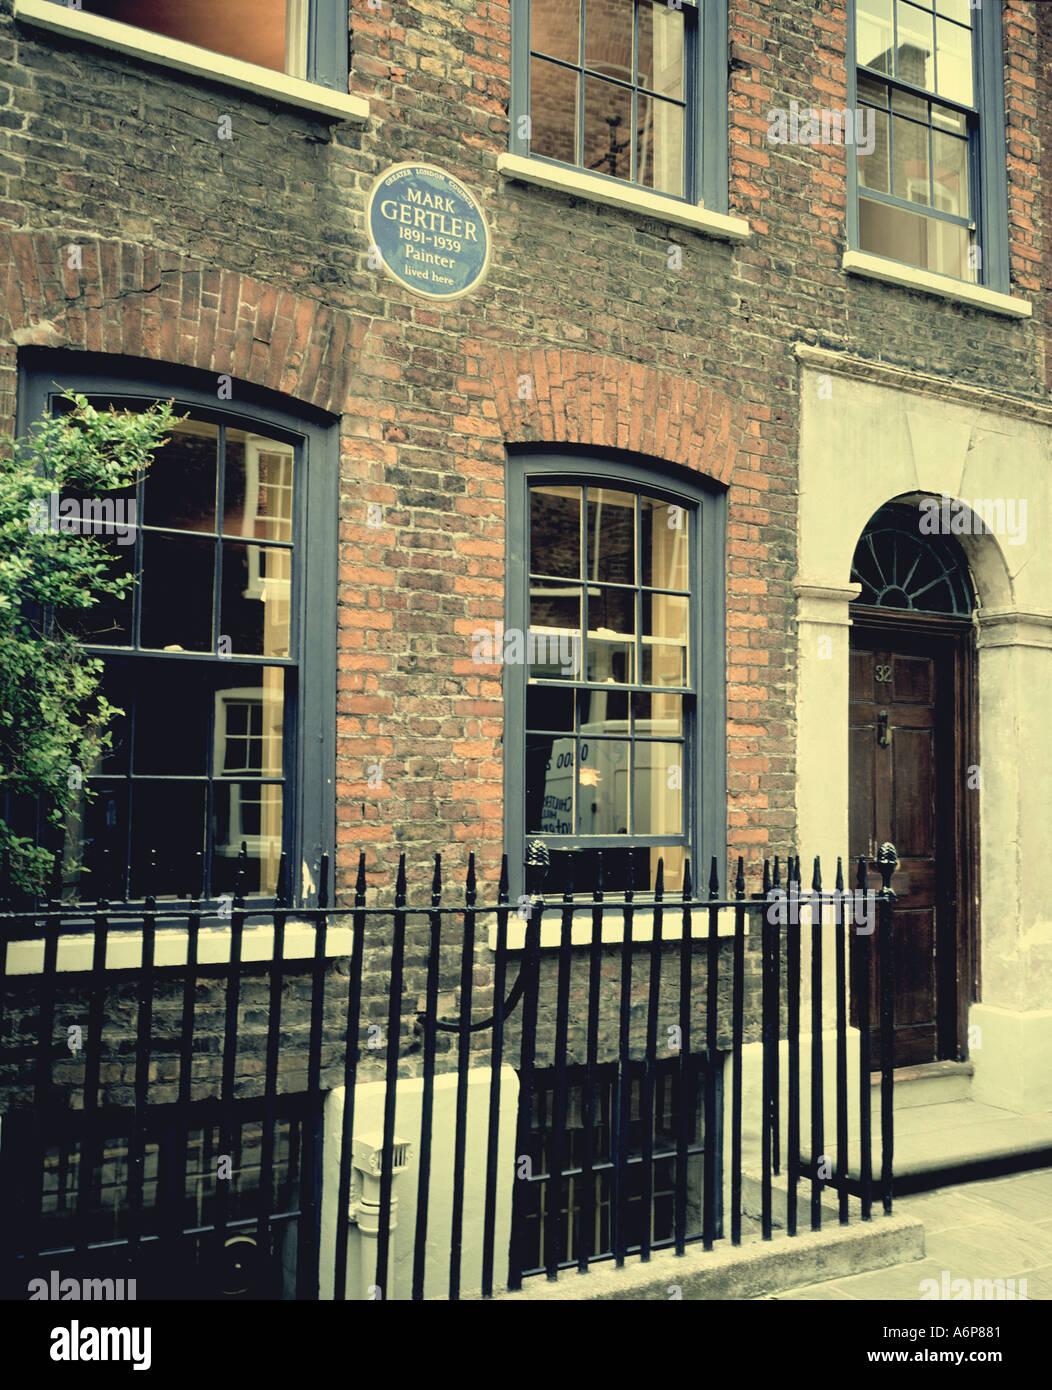 House of Mark Gertler jewish artist Elder street east end london